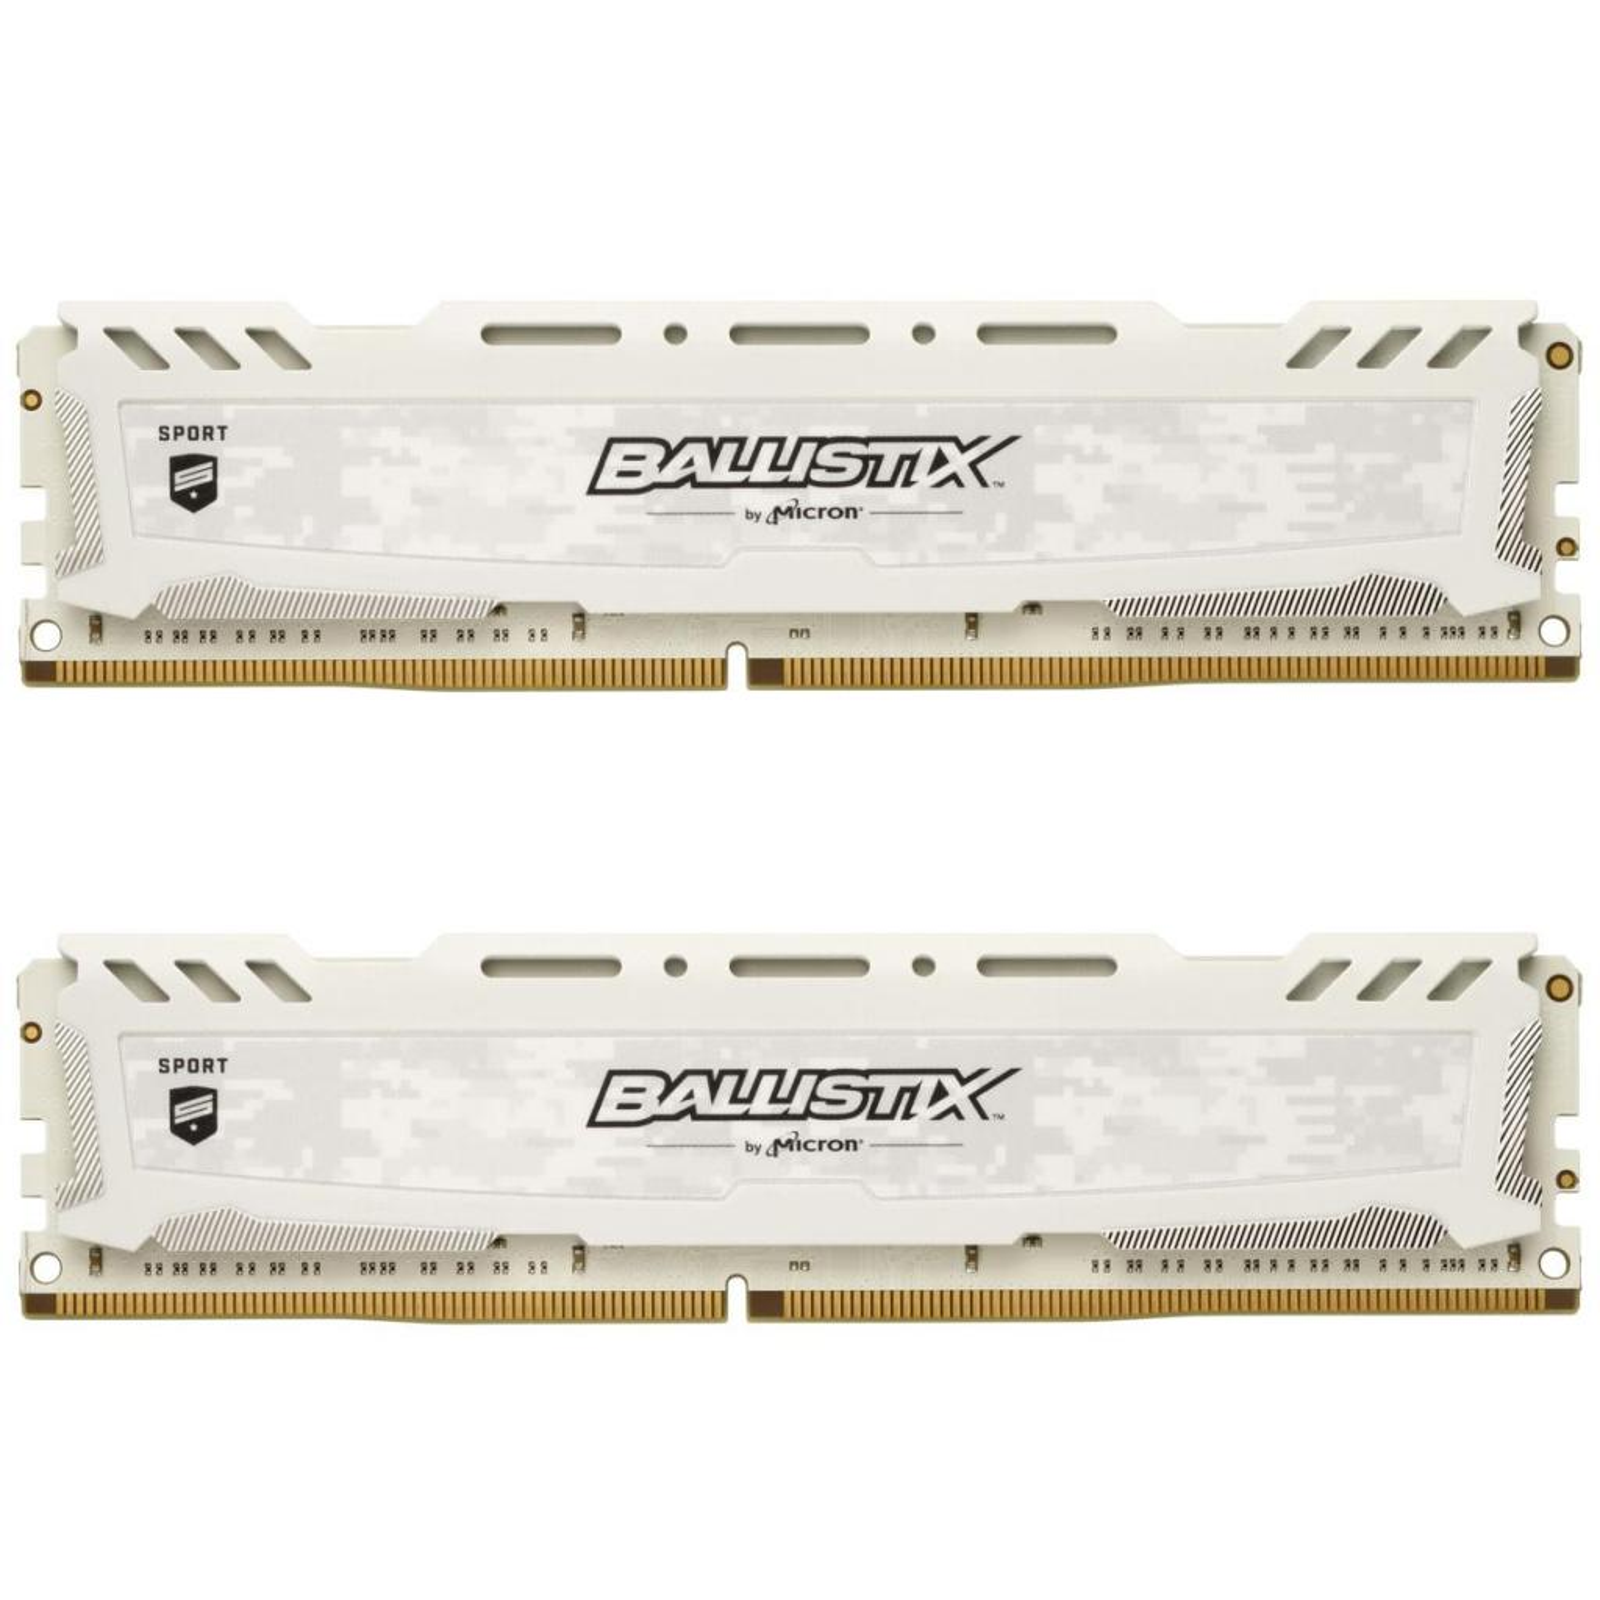 Модуль памяти для компьютера DDR4 16GB (2x8GB) 2666 MHz Ballistix Sport LT Micron (BLS2C8G4D26BFSCK)